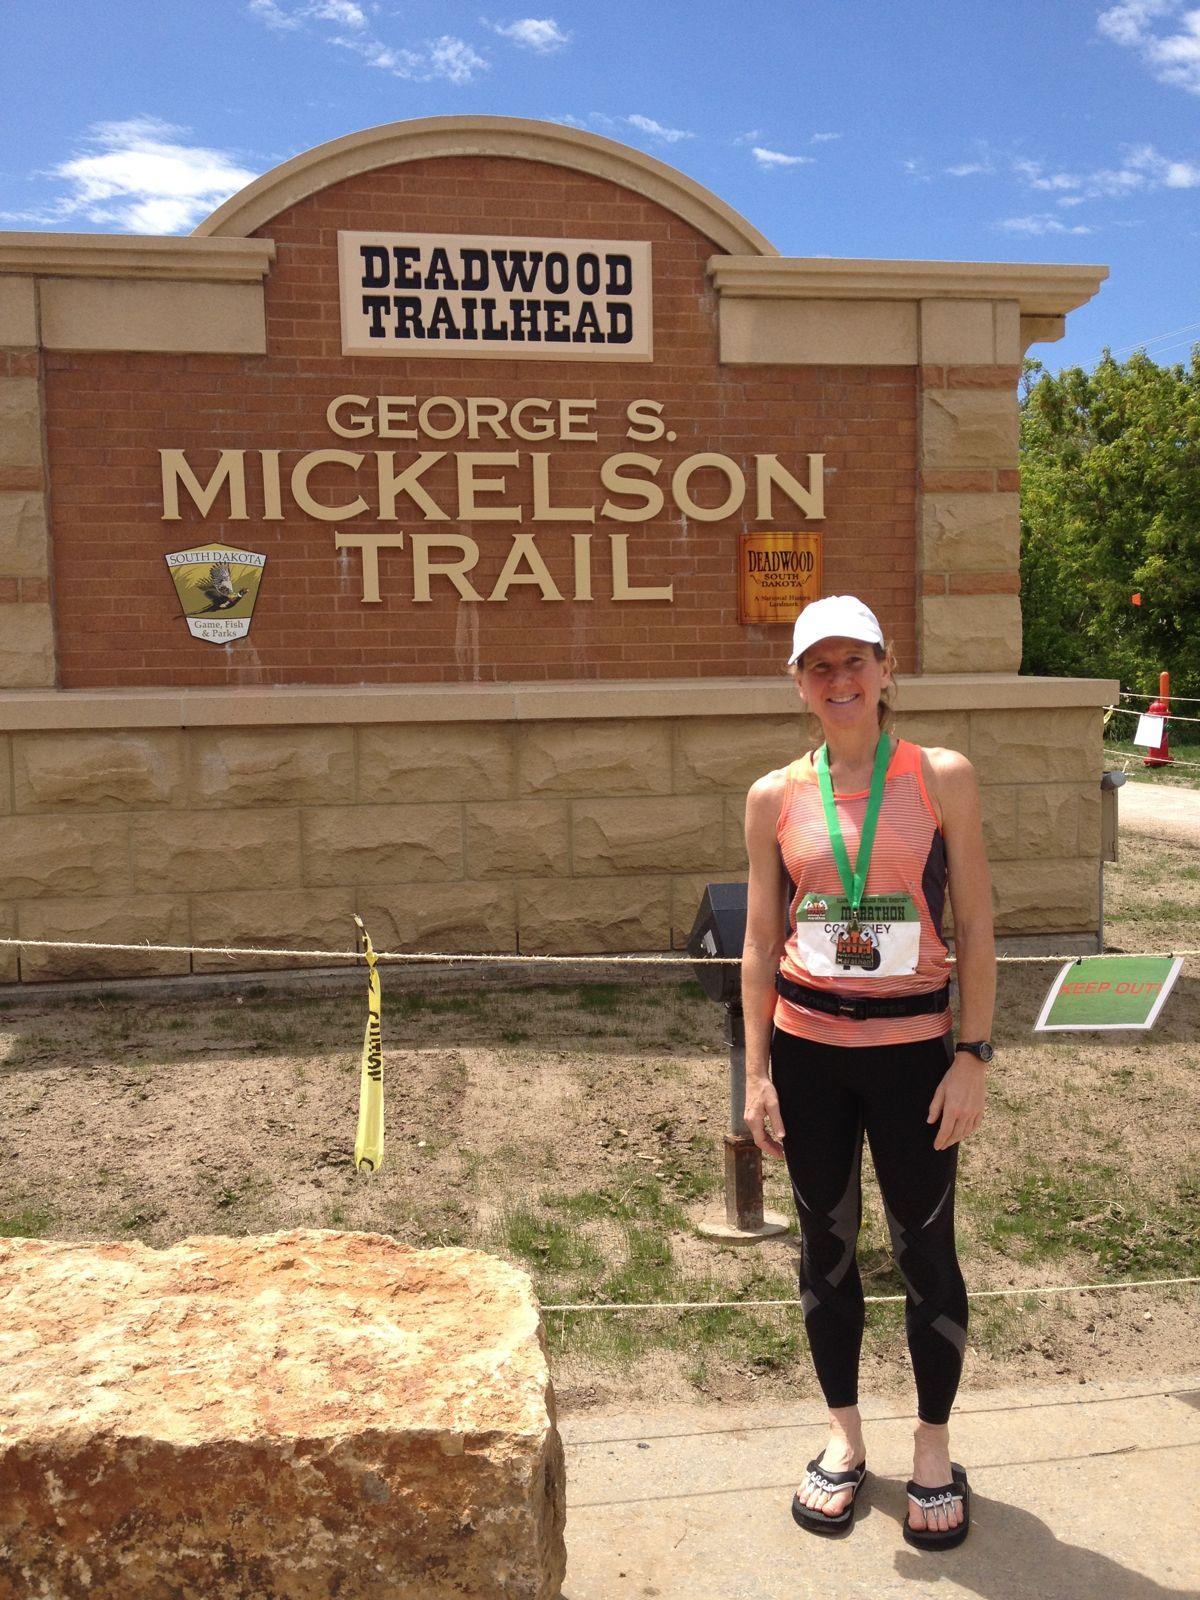 Mickelson Trail Elevation Map.50 State Marathon Journey 33 Deadwood Mickelson Trail Marathon